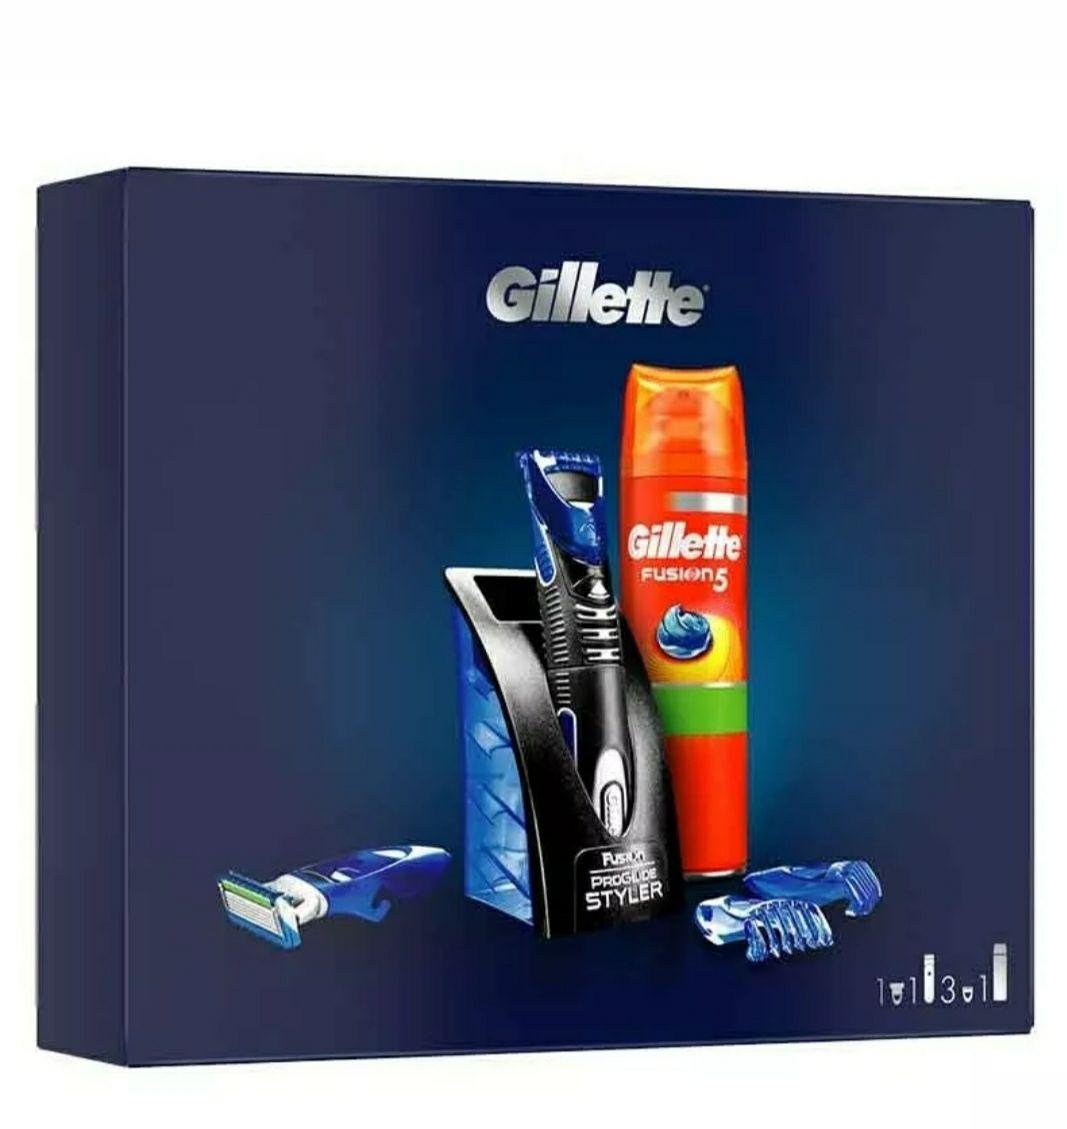 Formato REGALO: Gillette Styler Multiusos + Gel De Afeitado Gillette Fusion 5 + 3Peines